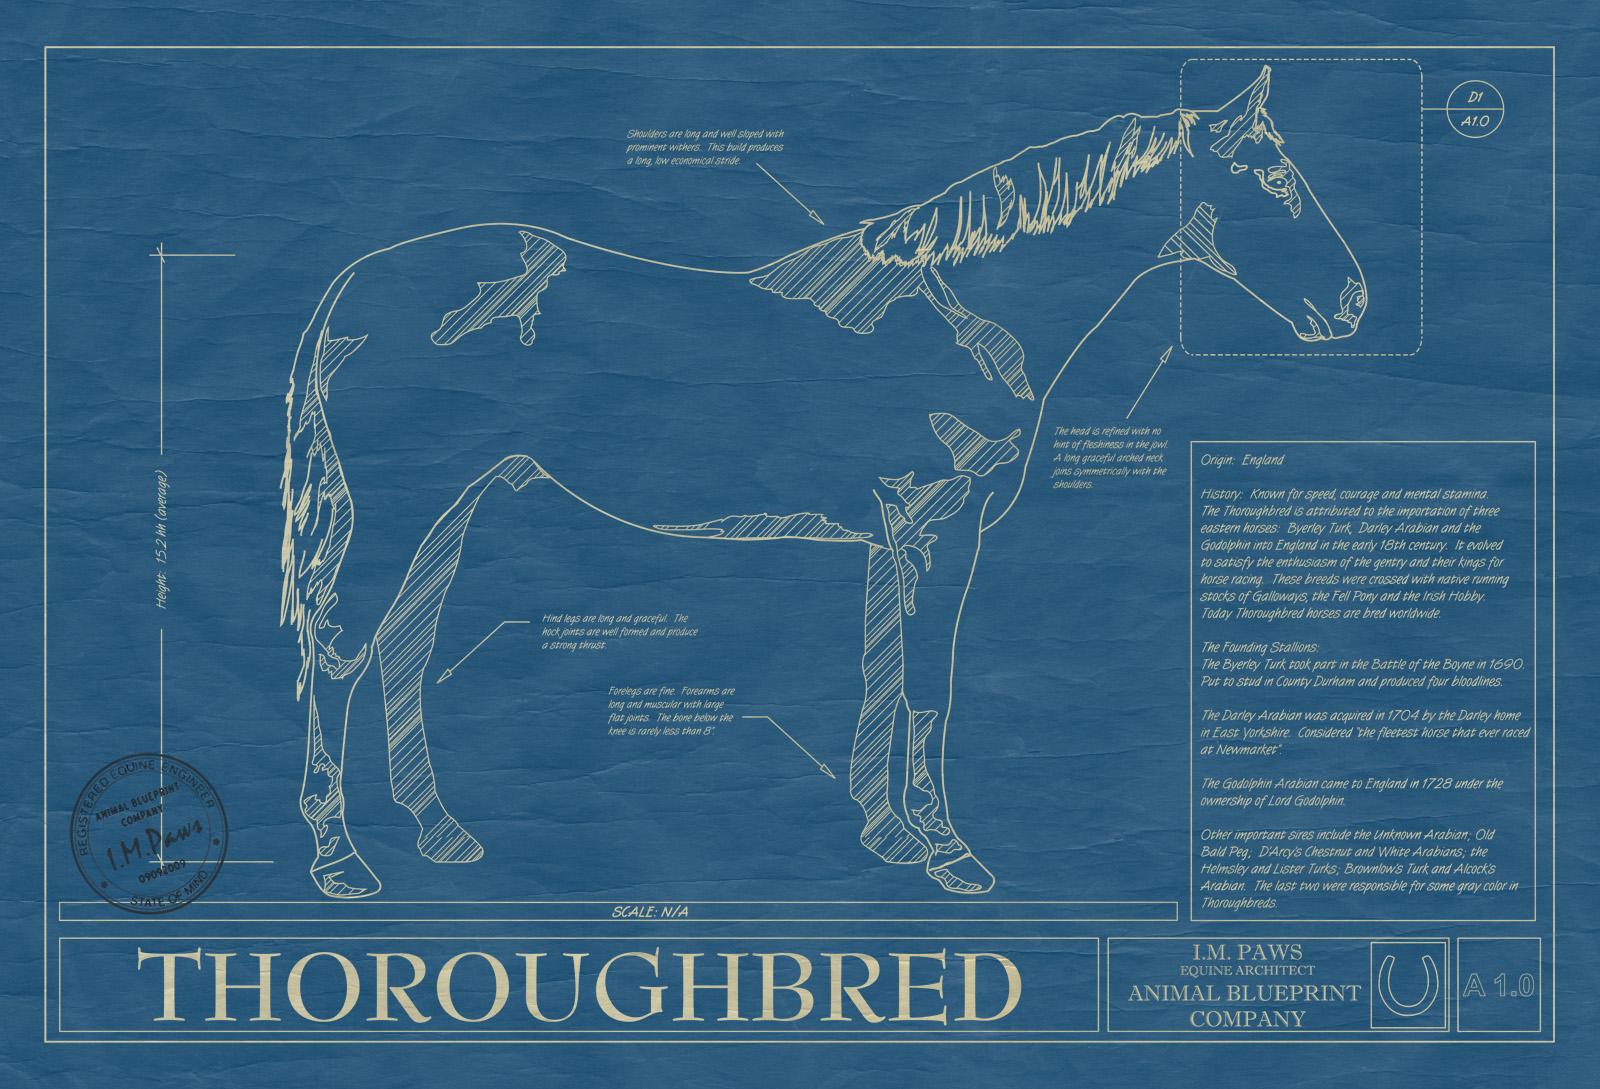 Thoroughbred horse animal blueprint company thoroughbred horse blueprint malvernweather Choice Image